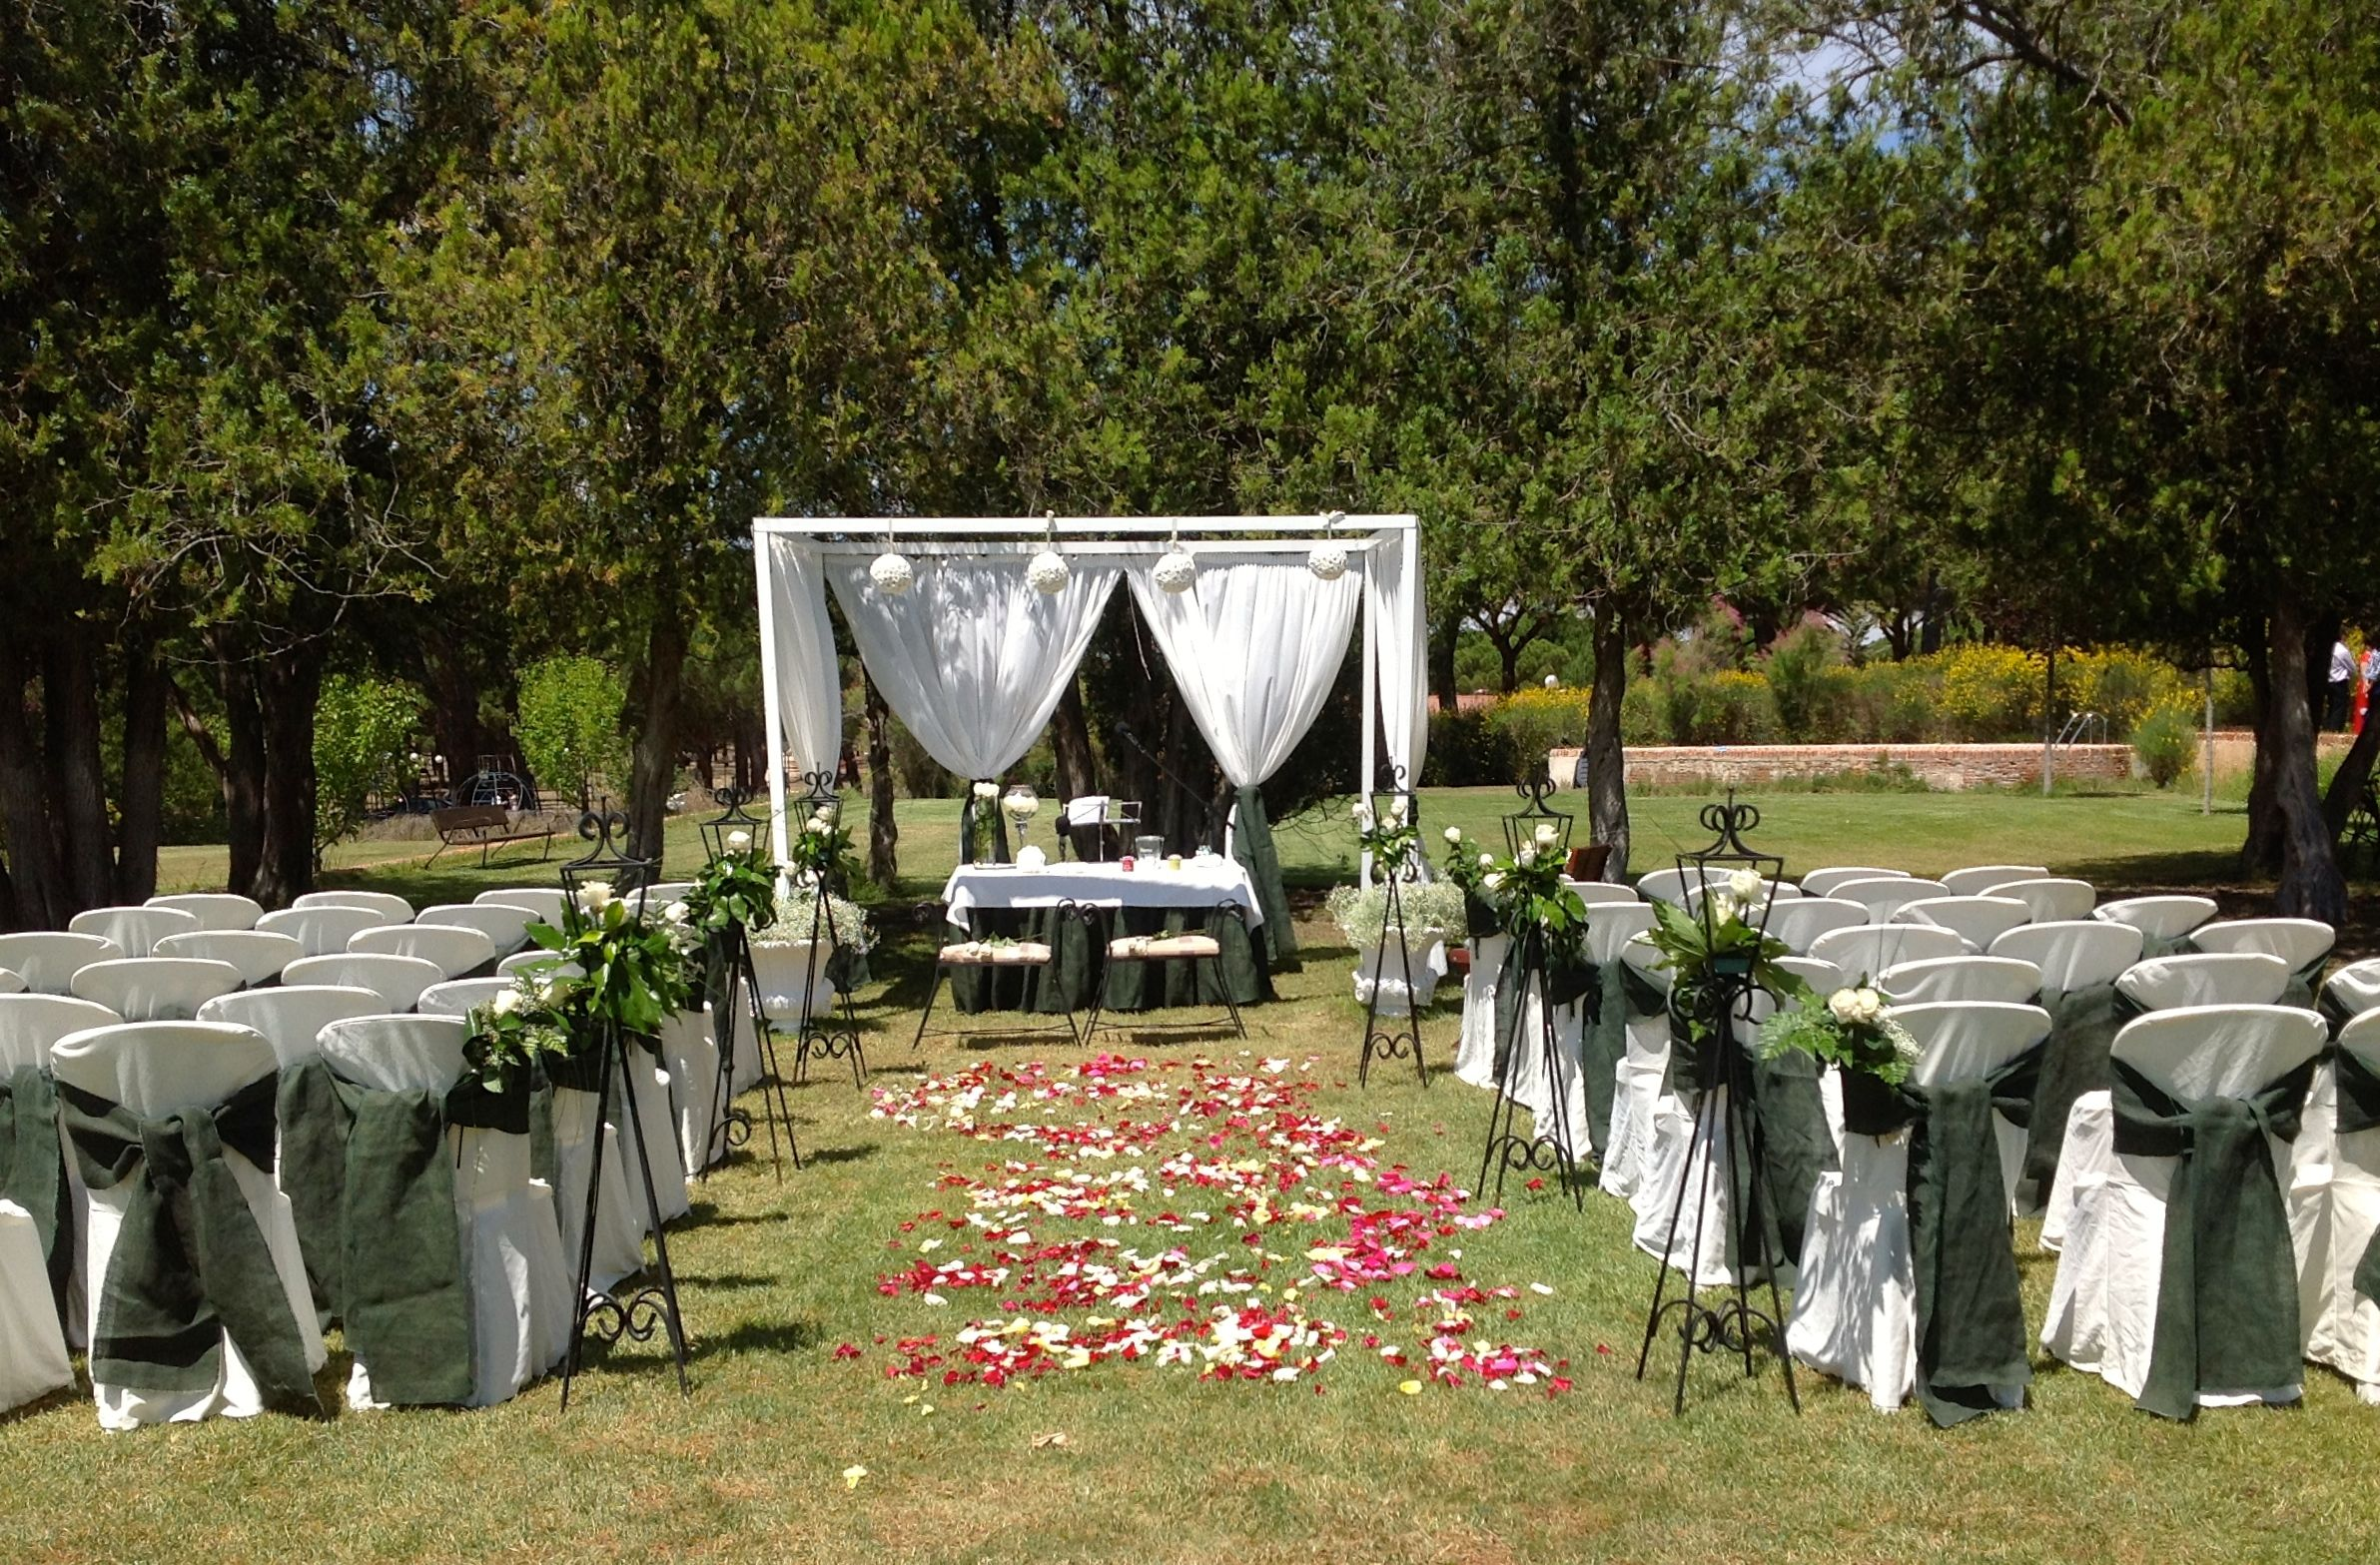 Decoracion boda civil en jardin cheap decoracion boda - Decoracion jardin boda civil ...